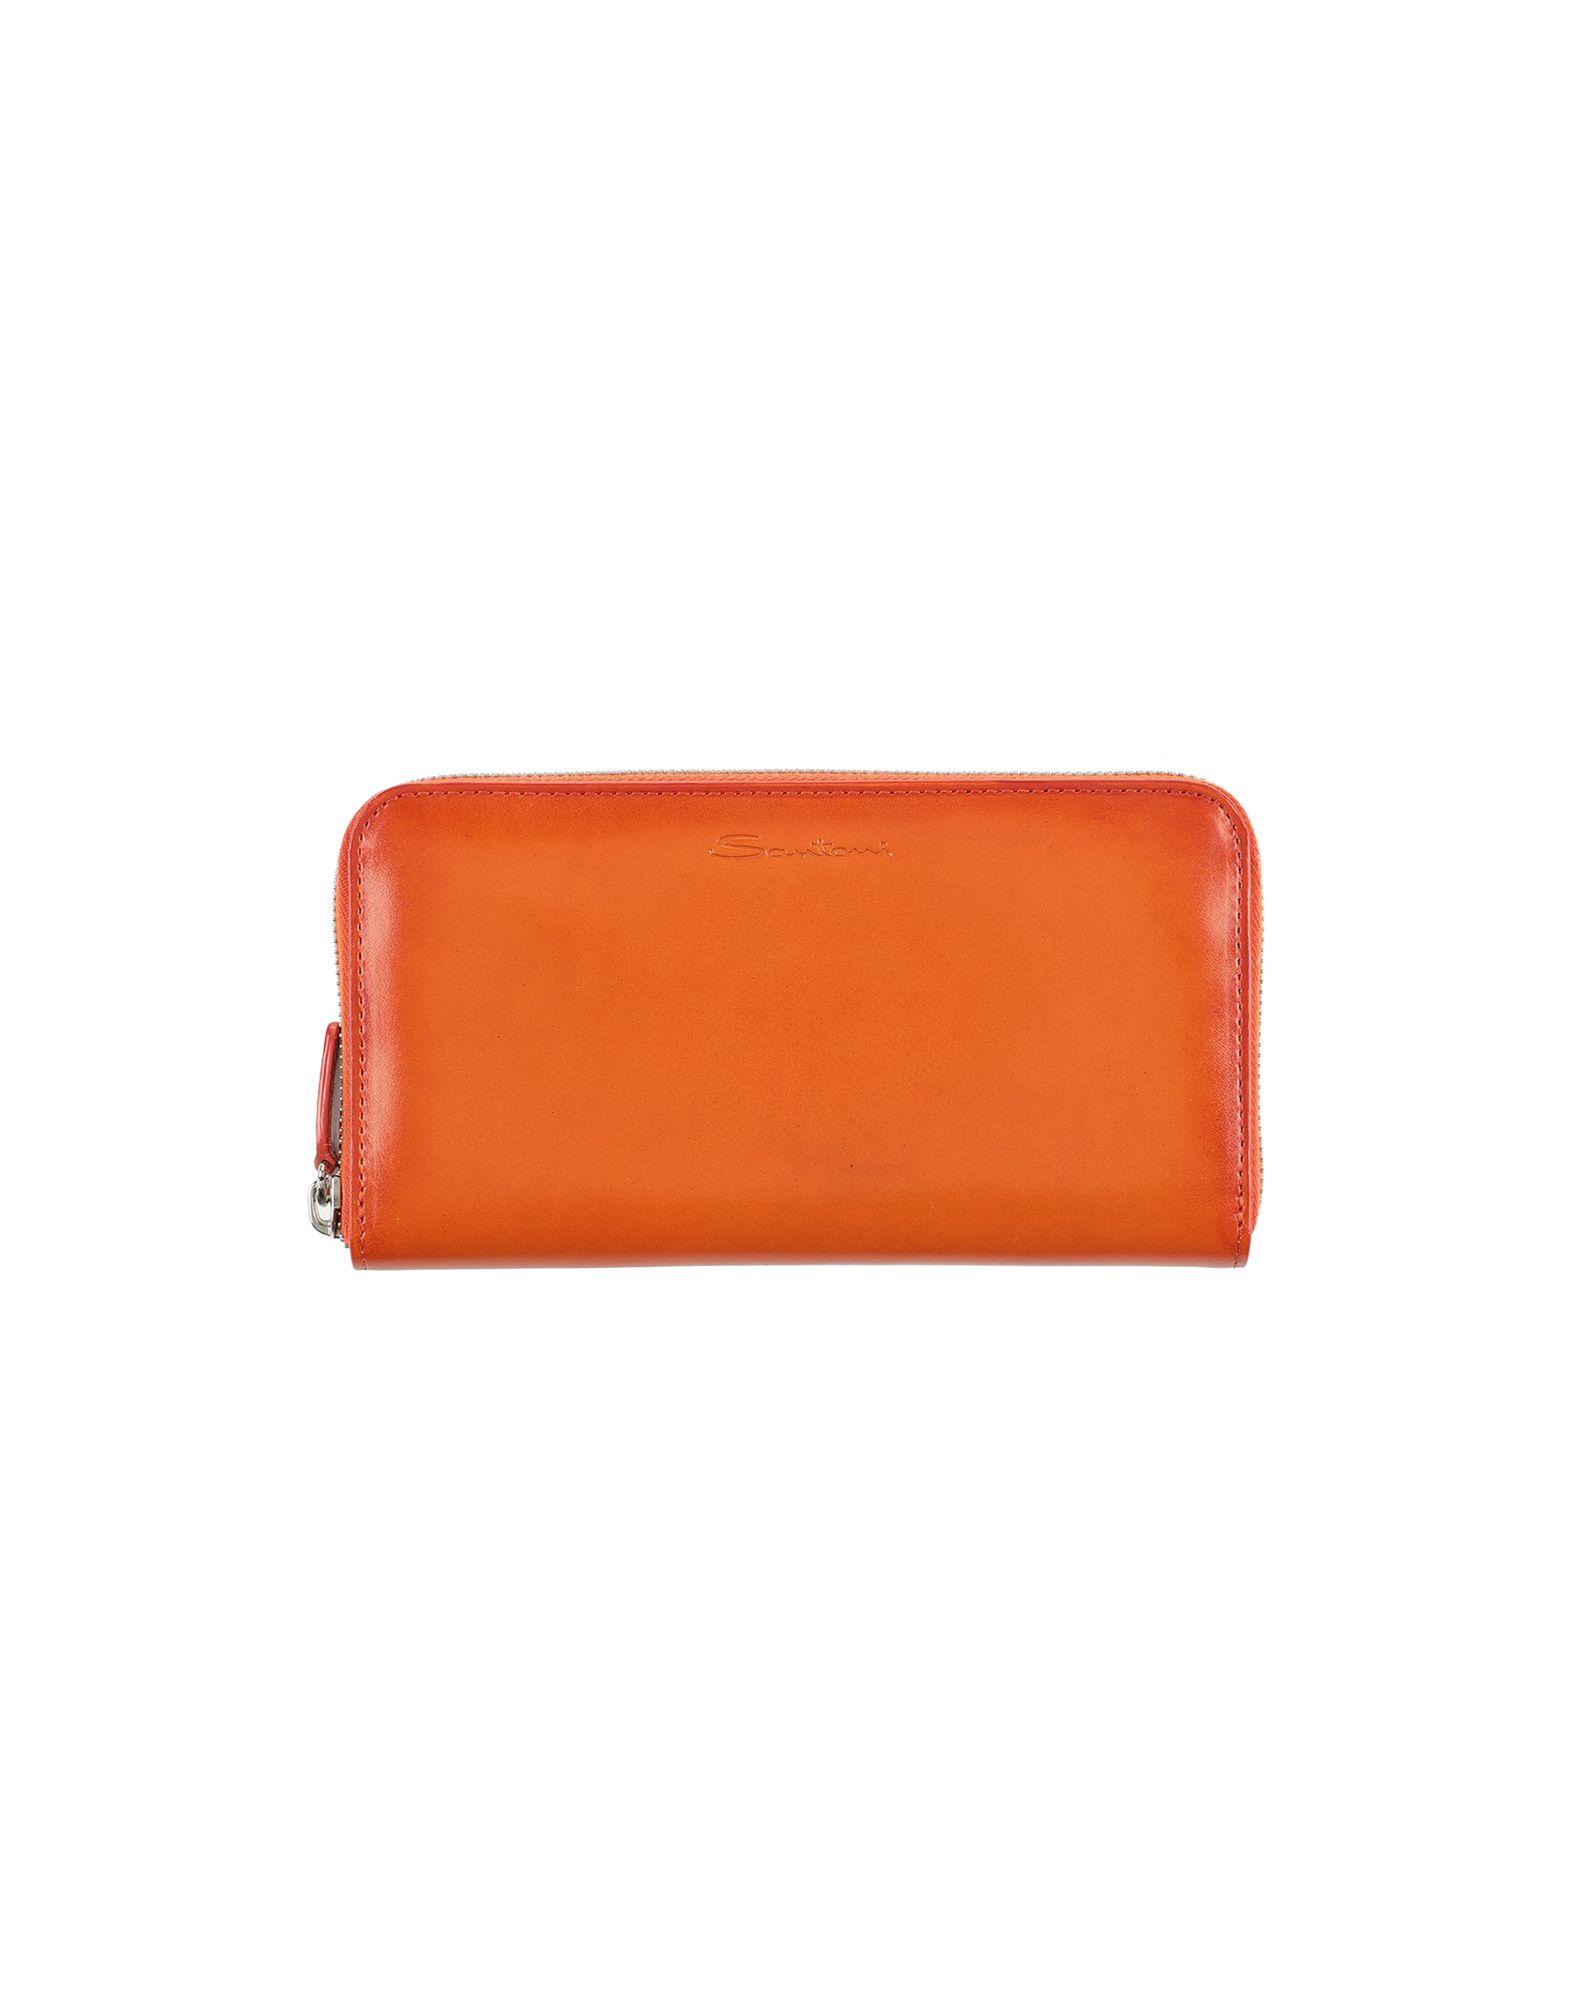 SANTONI Wallets. logo, solid color, zipper closure, internal card slots, contains non-textile parts of animal origin. Soft Leather